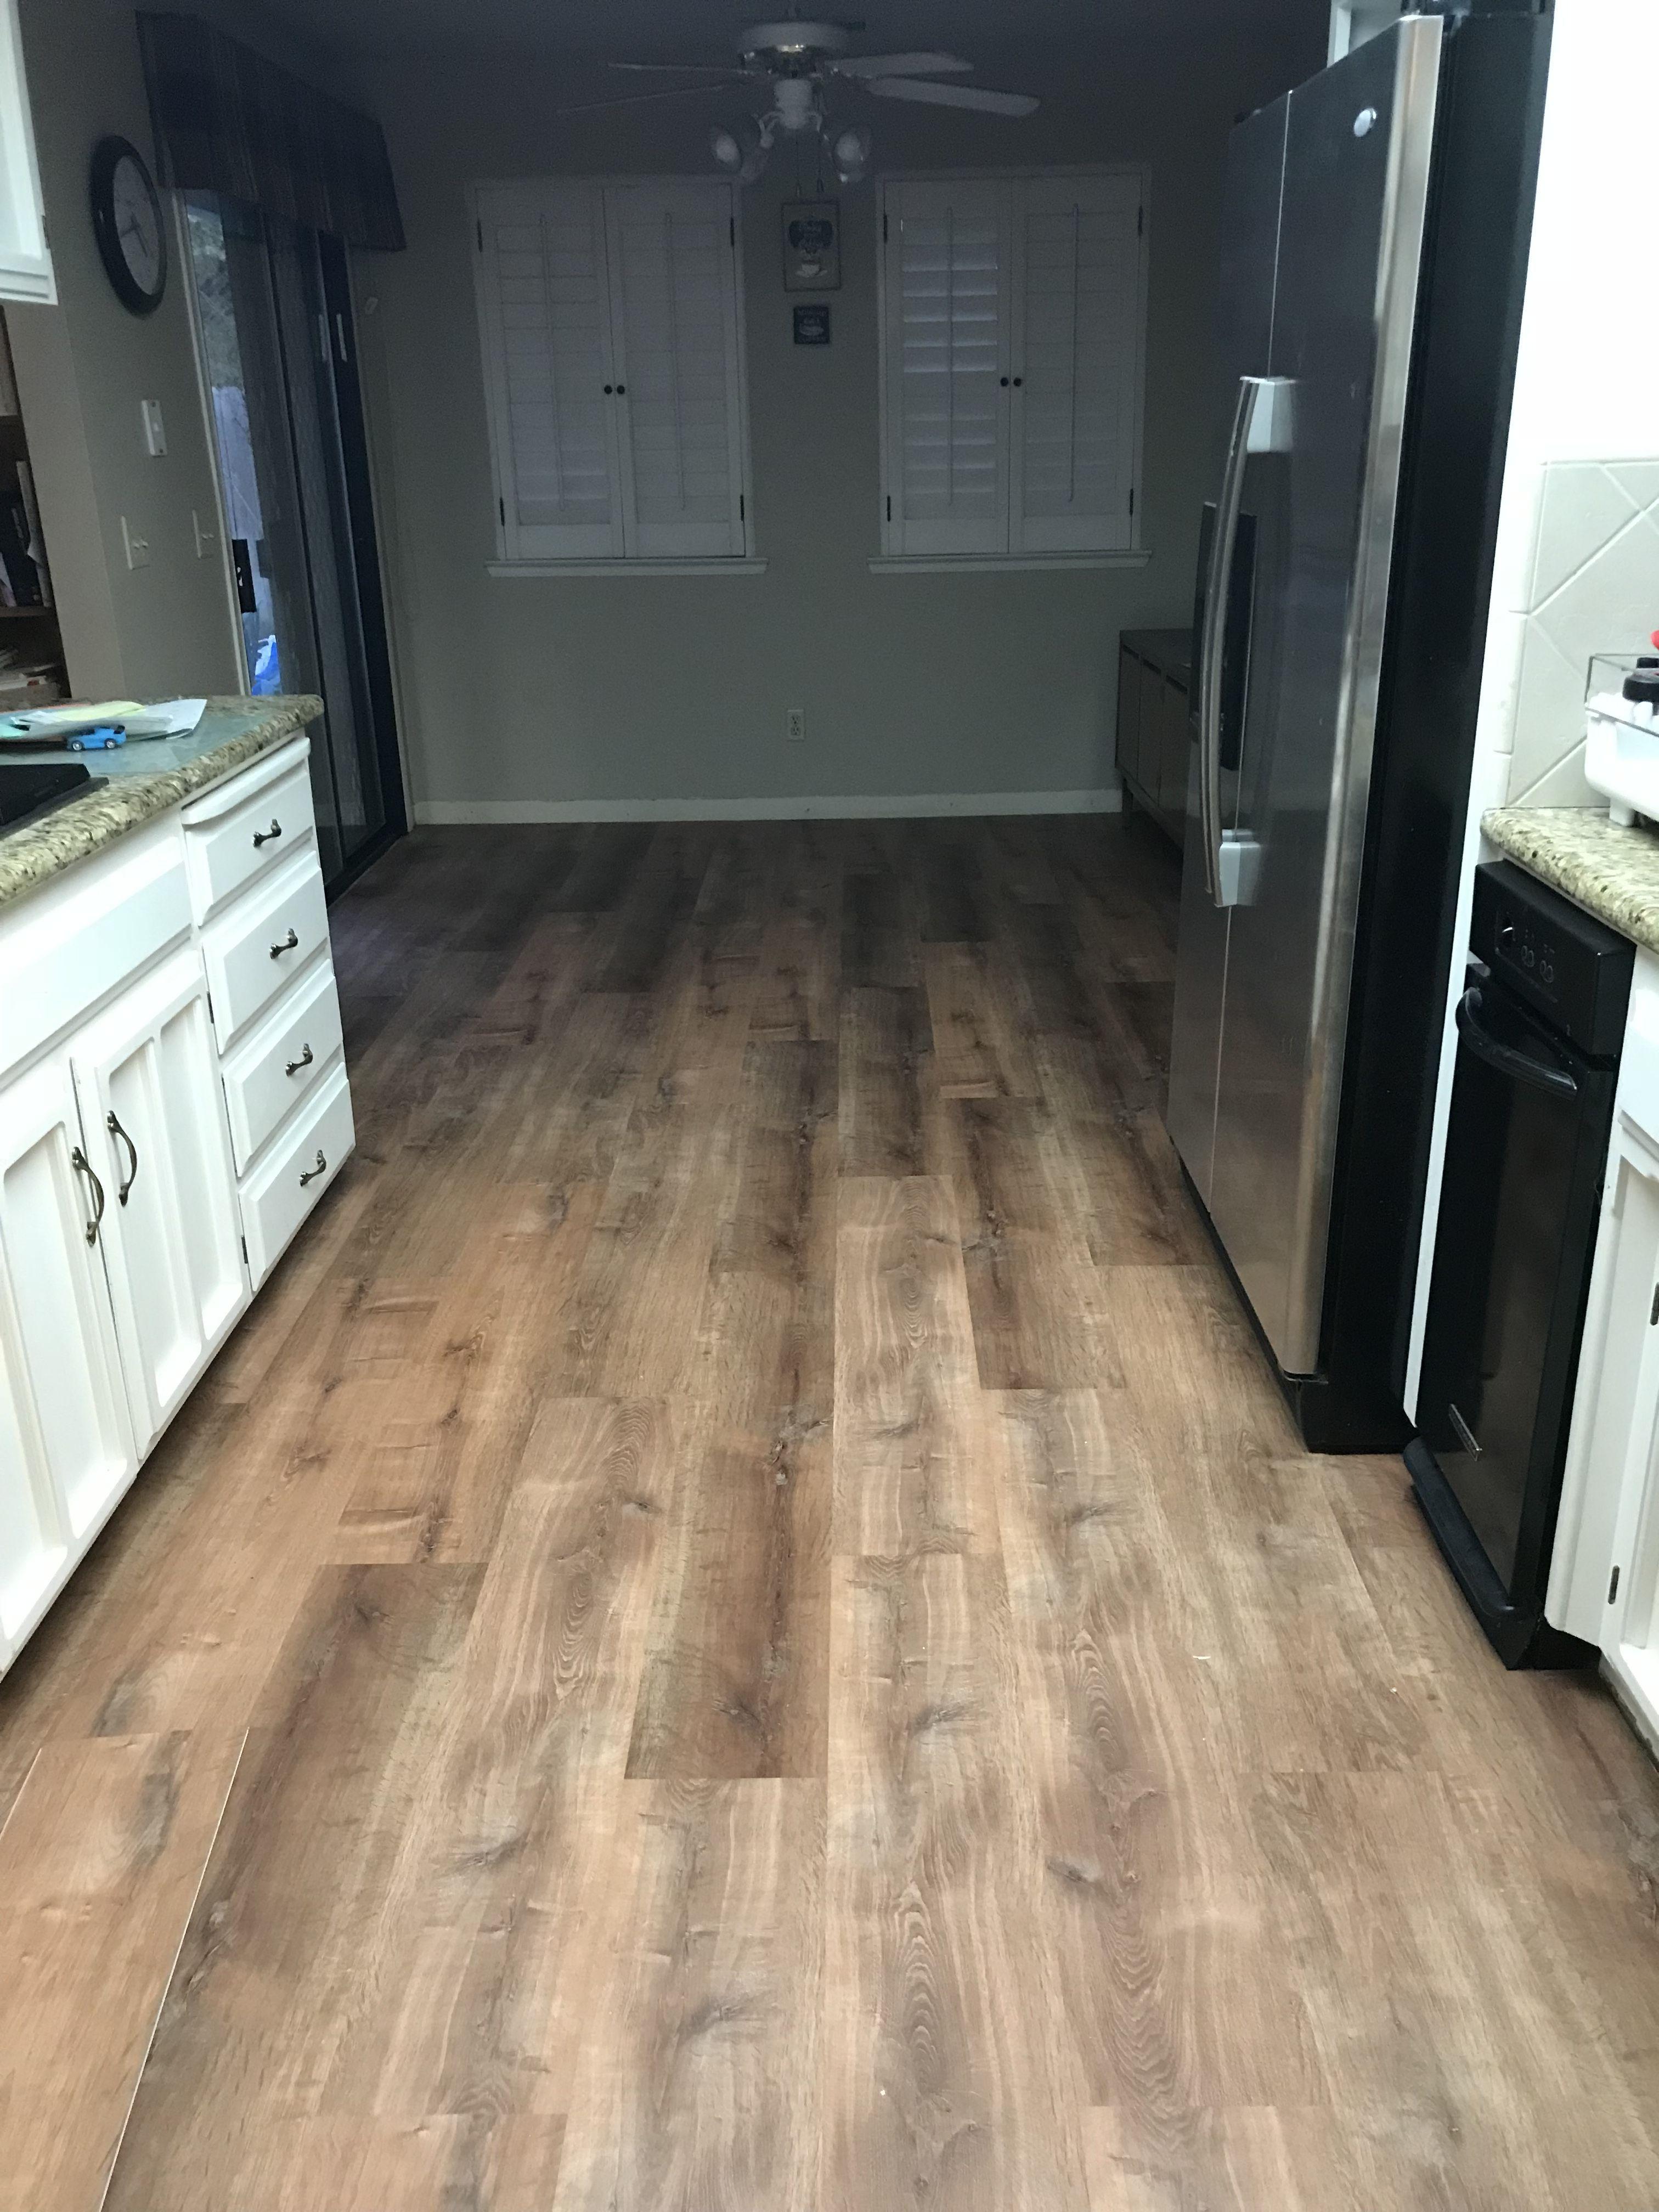 Waterproof Laminate Flooring Pictures Ideas Expert Tips